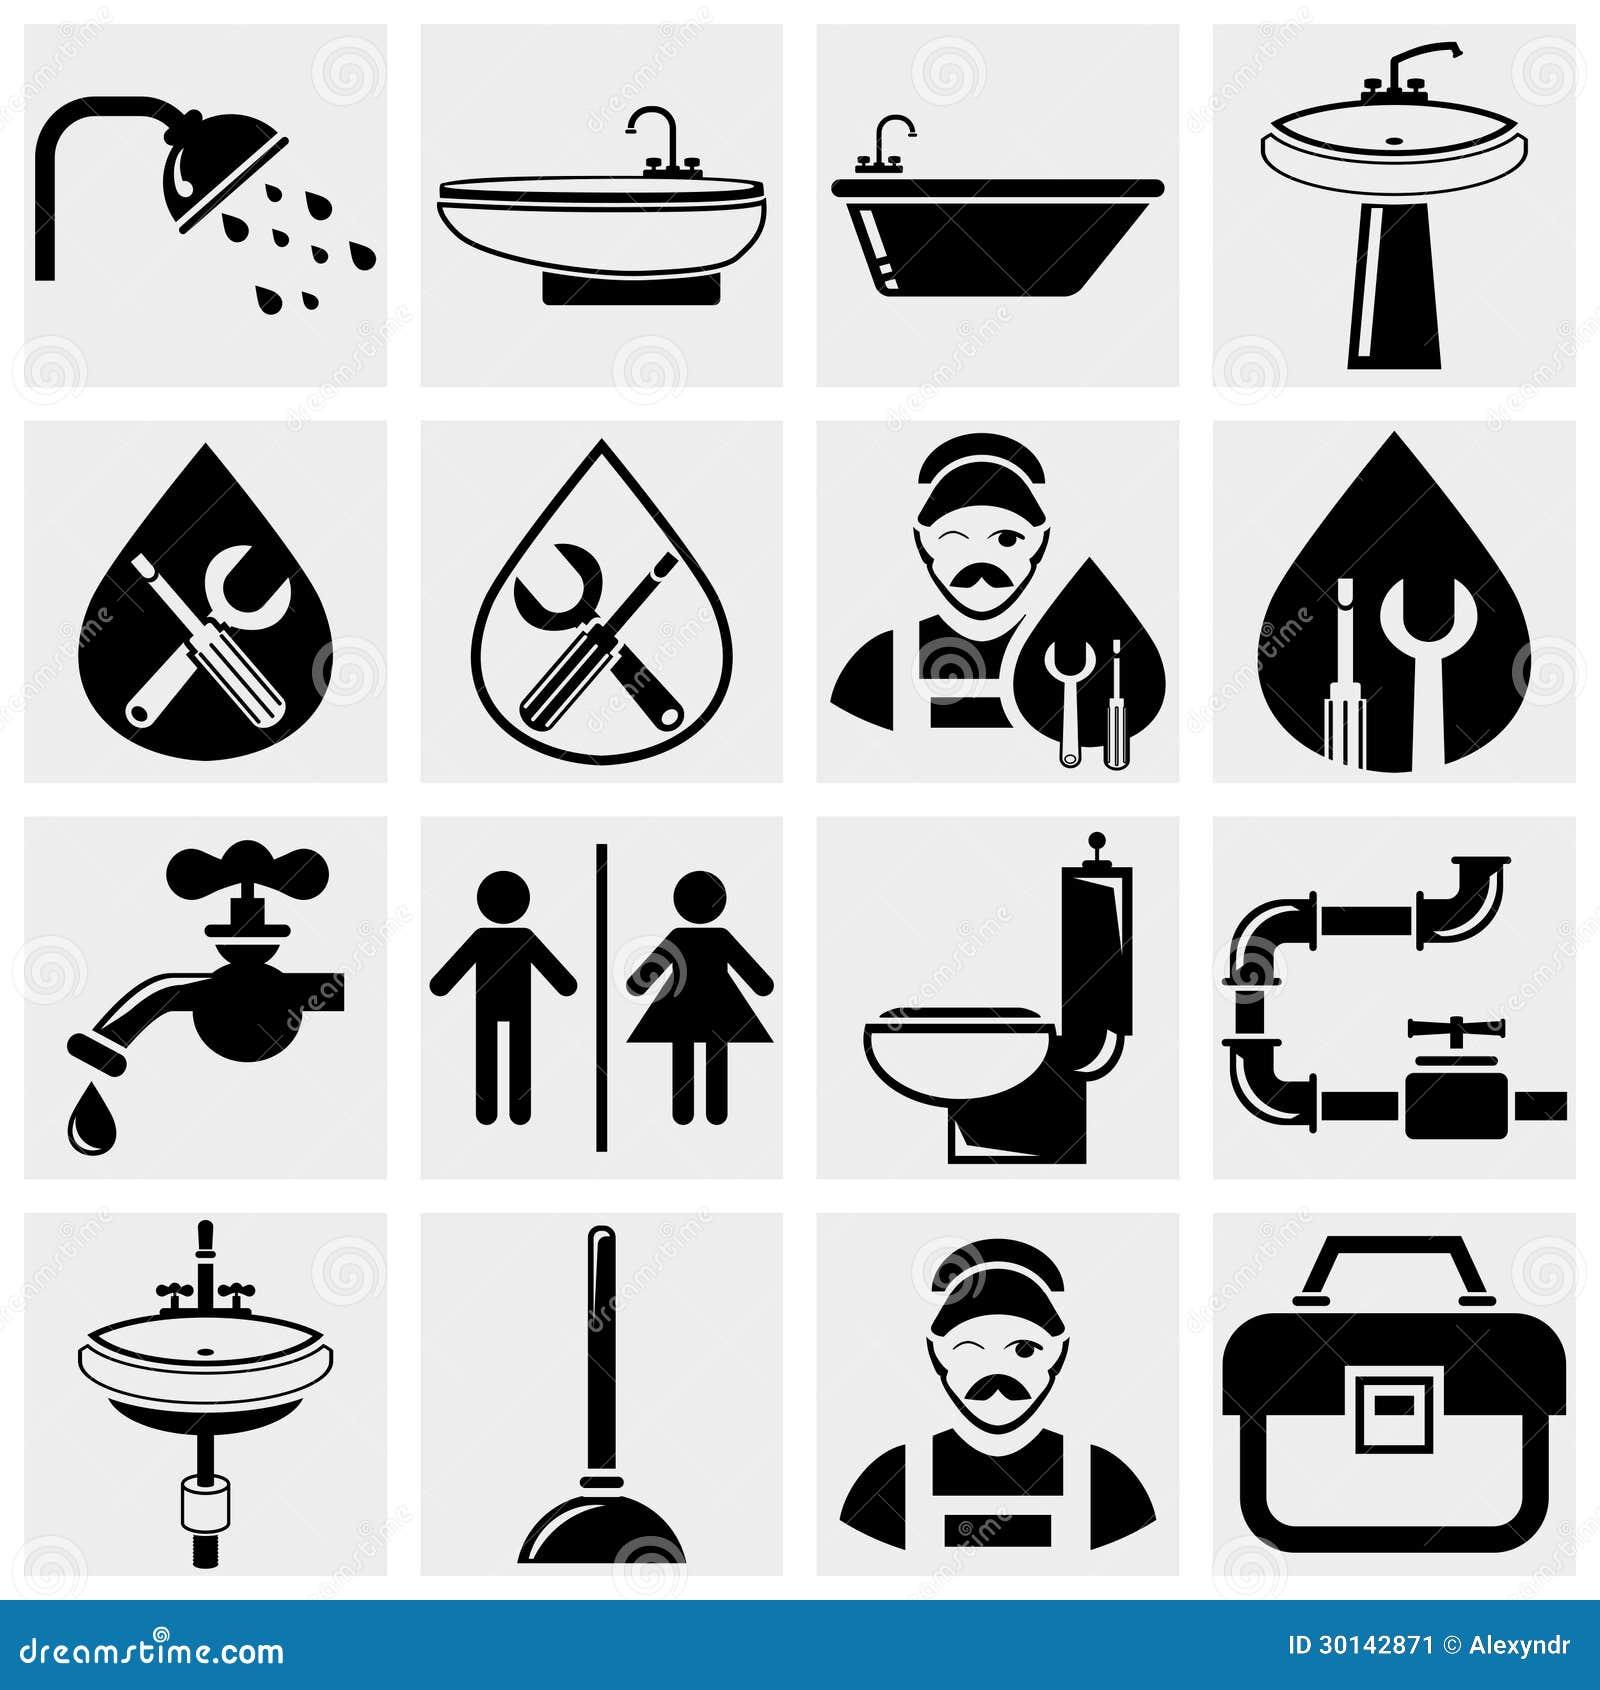 Plumbing And Bathroom Vector Icons Set Stock Image Image